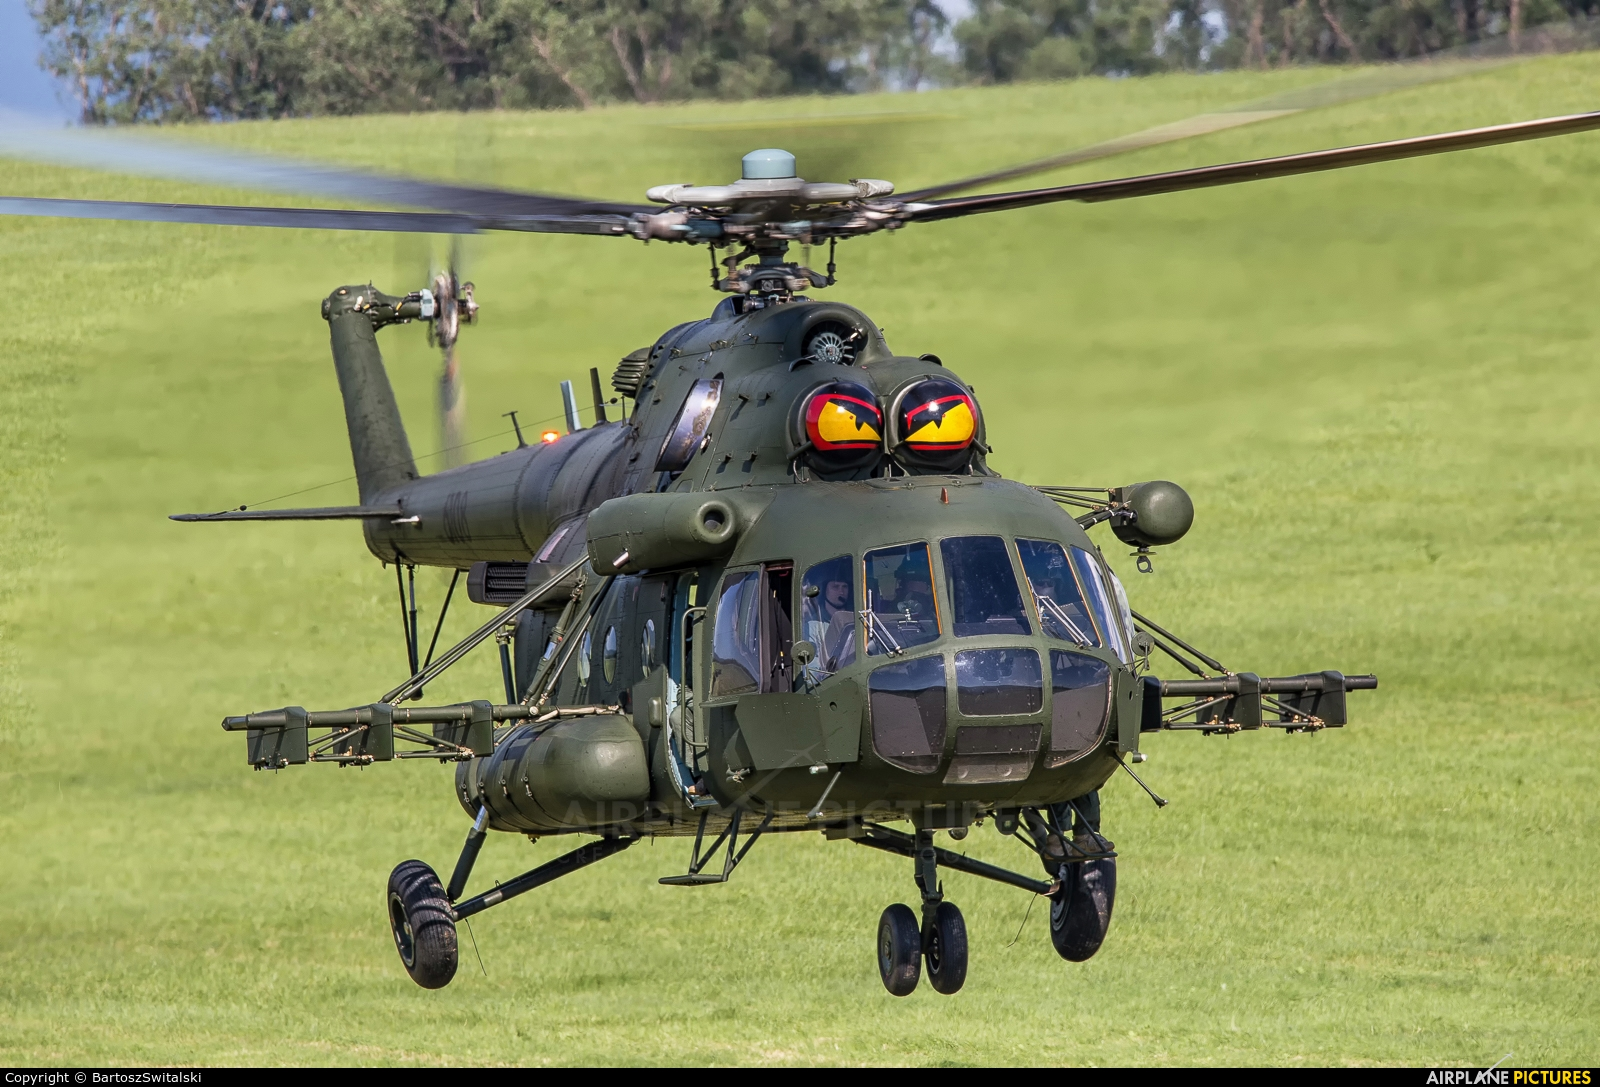 Poland - Army 6108 aircraft at Off Airport - Poland